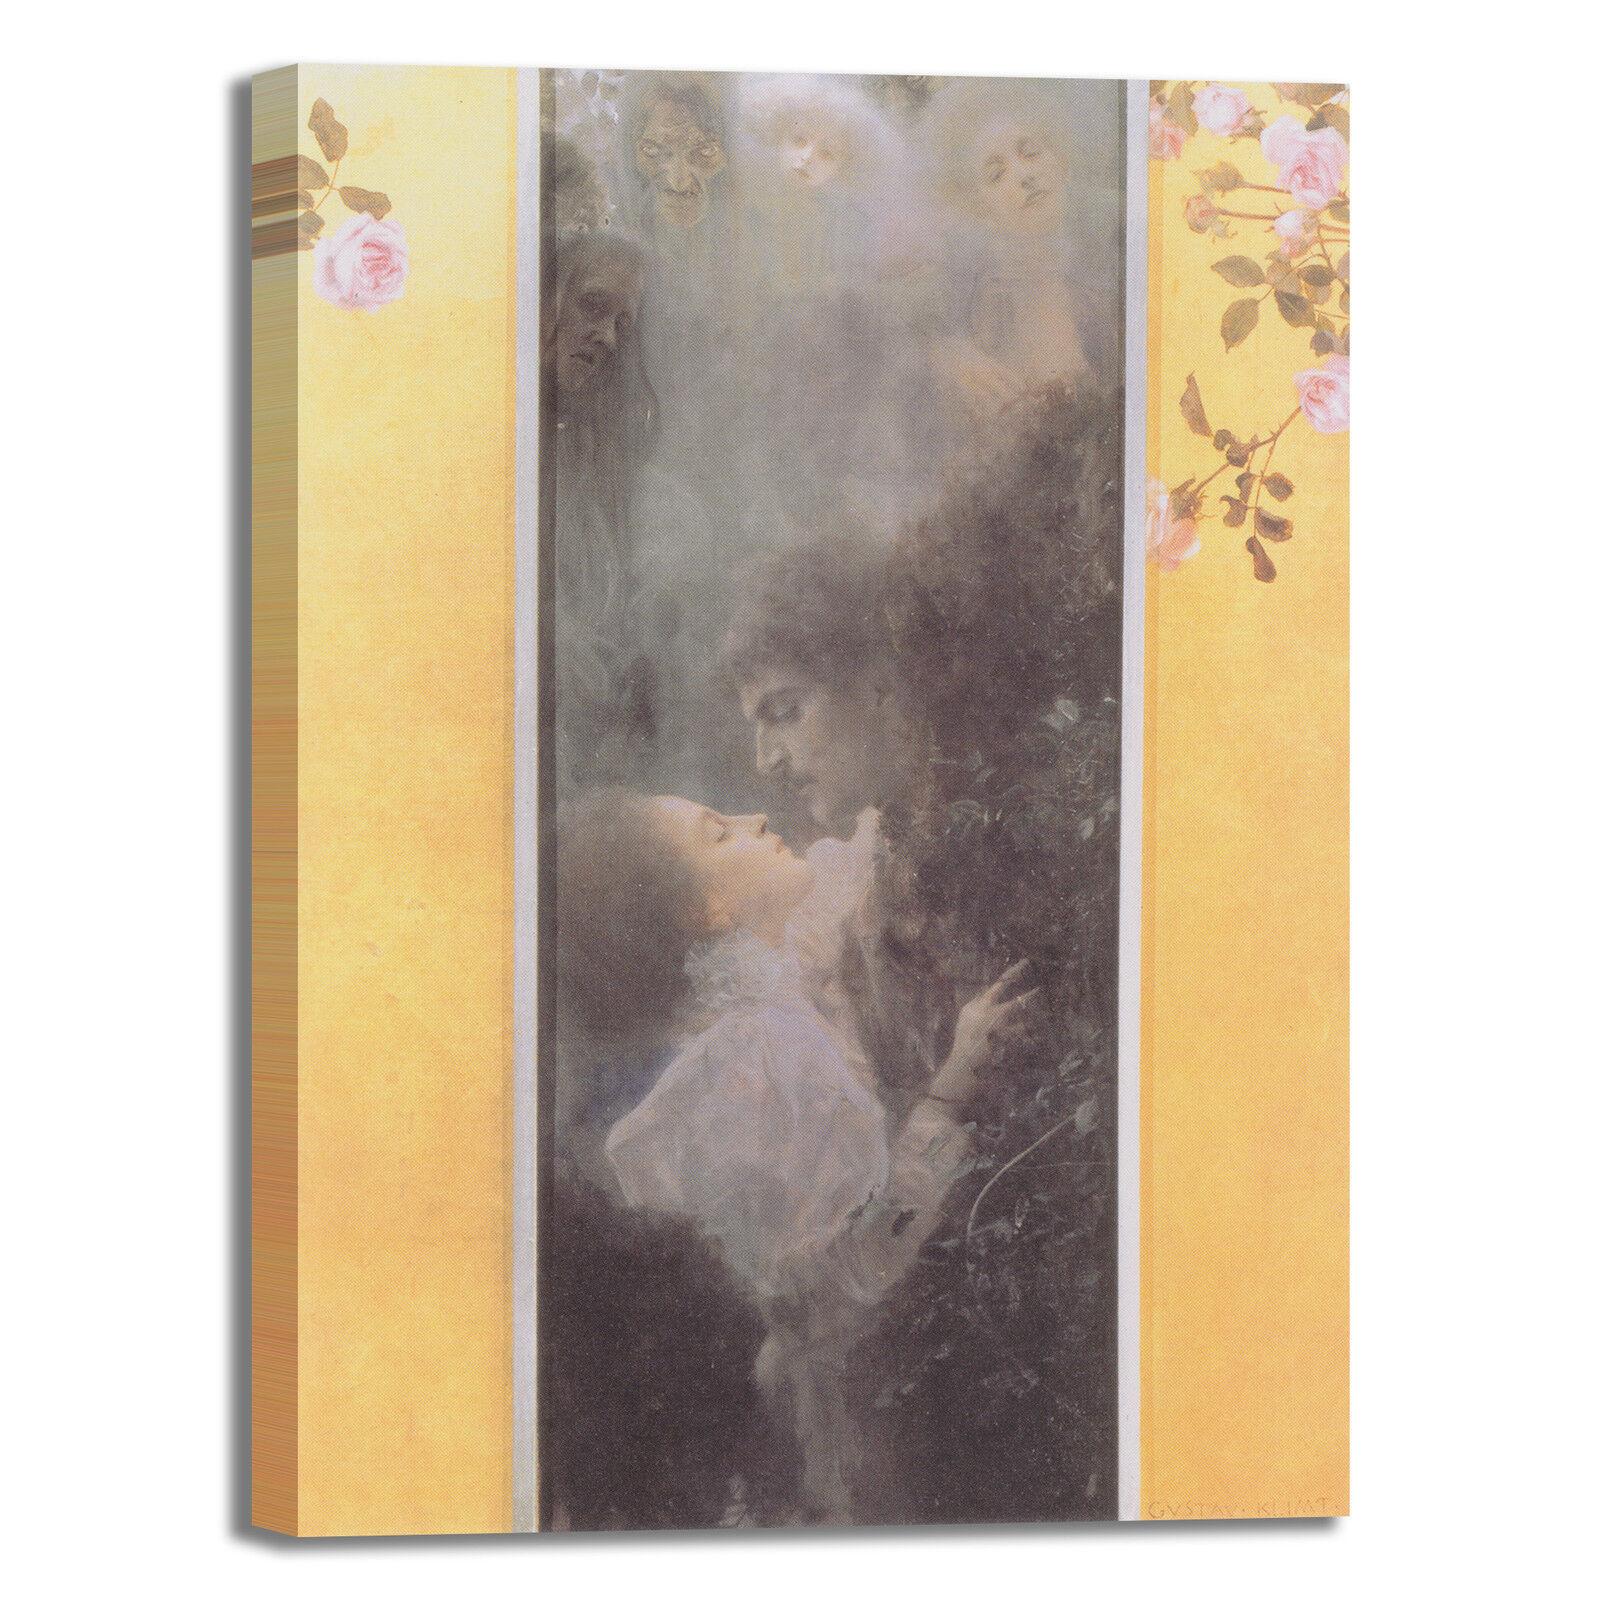 Gustav Klimt l'amore design quadro stampa tela dipinto telaio arroto casa